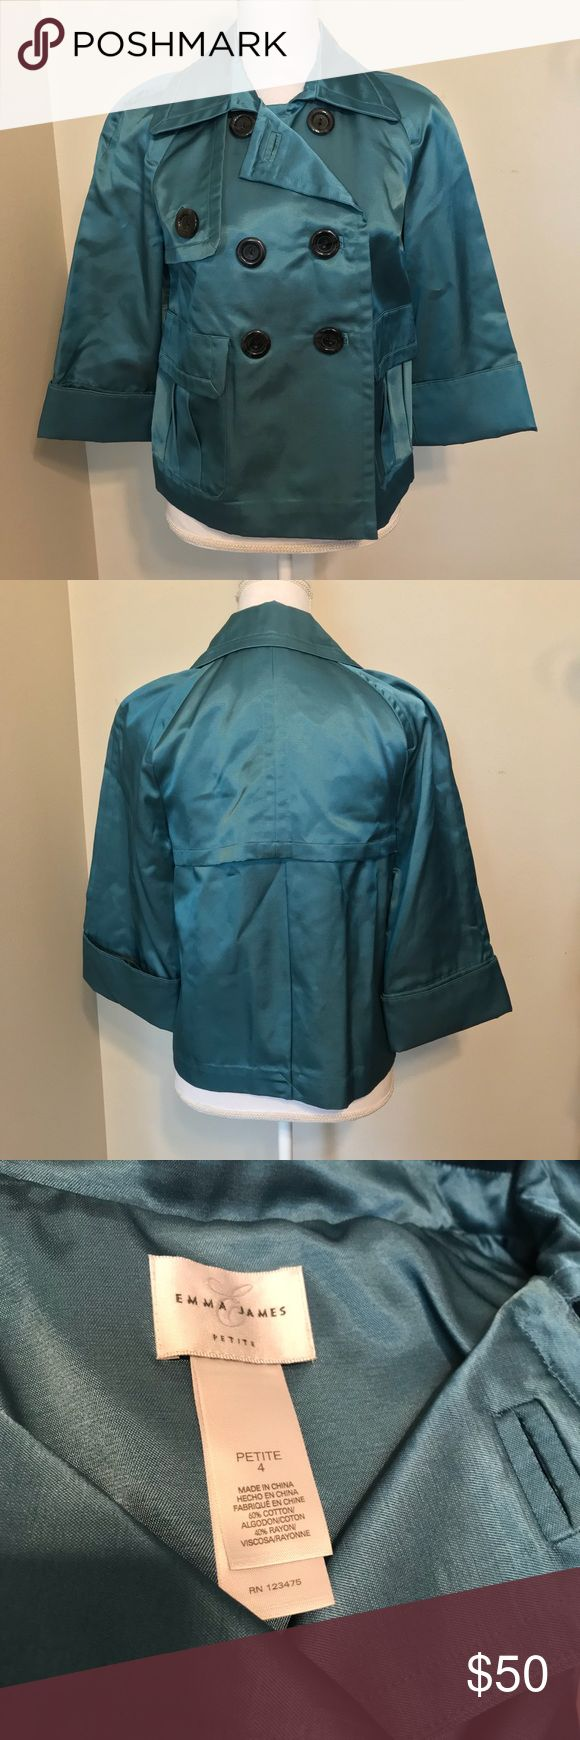 Emma James Petite Jacket Perfect condition Emma James Jackets & Coats Trench Coats